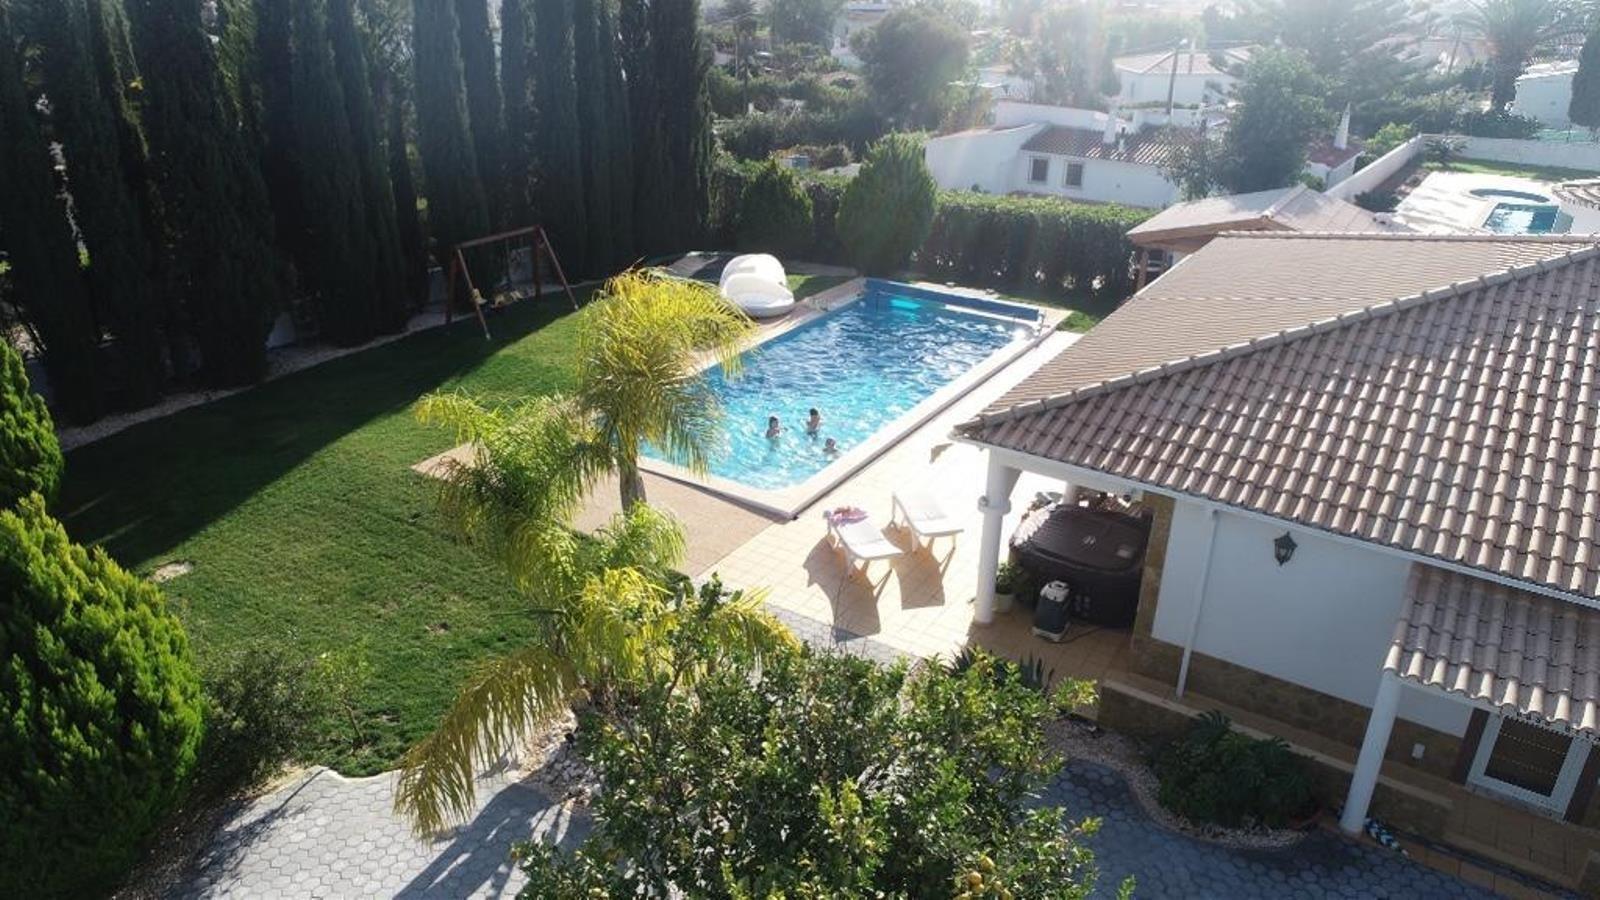 4 Bedroom Villa Praia da Luz, Western Algarve Ref: GV621